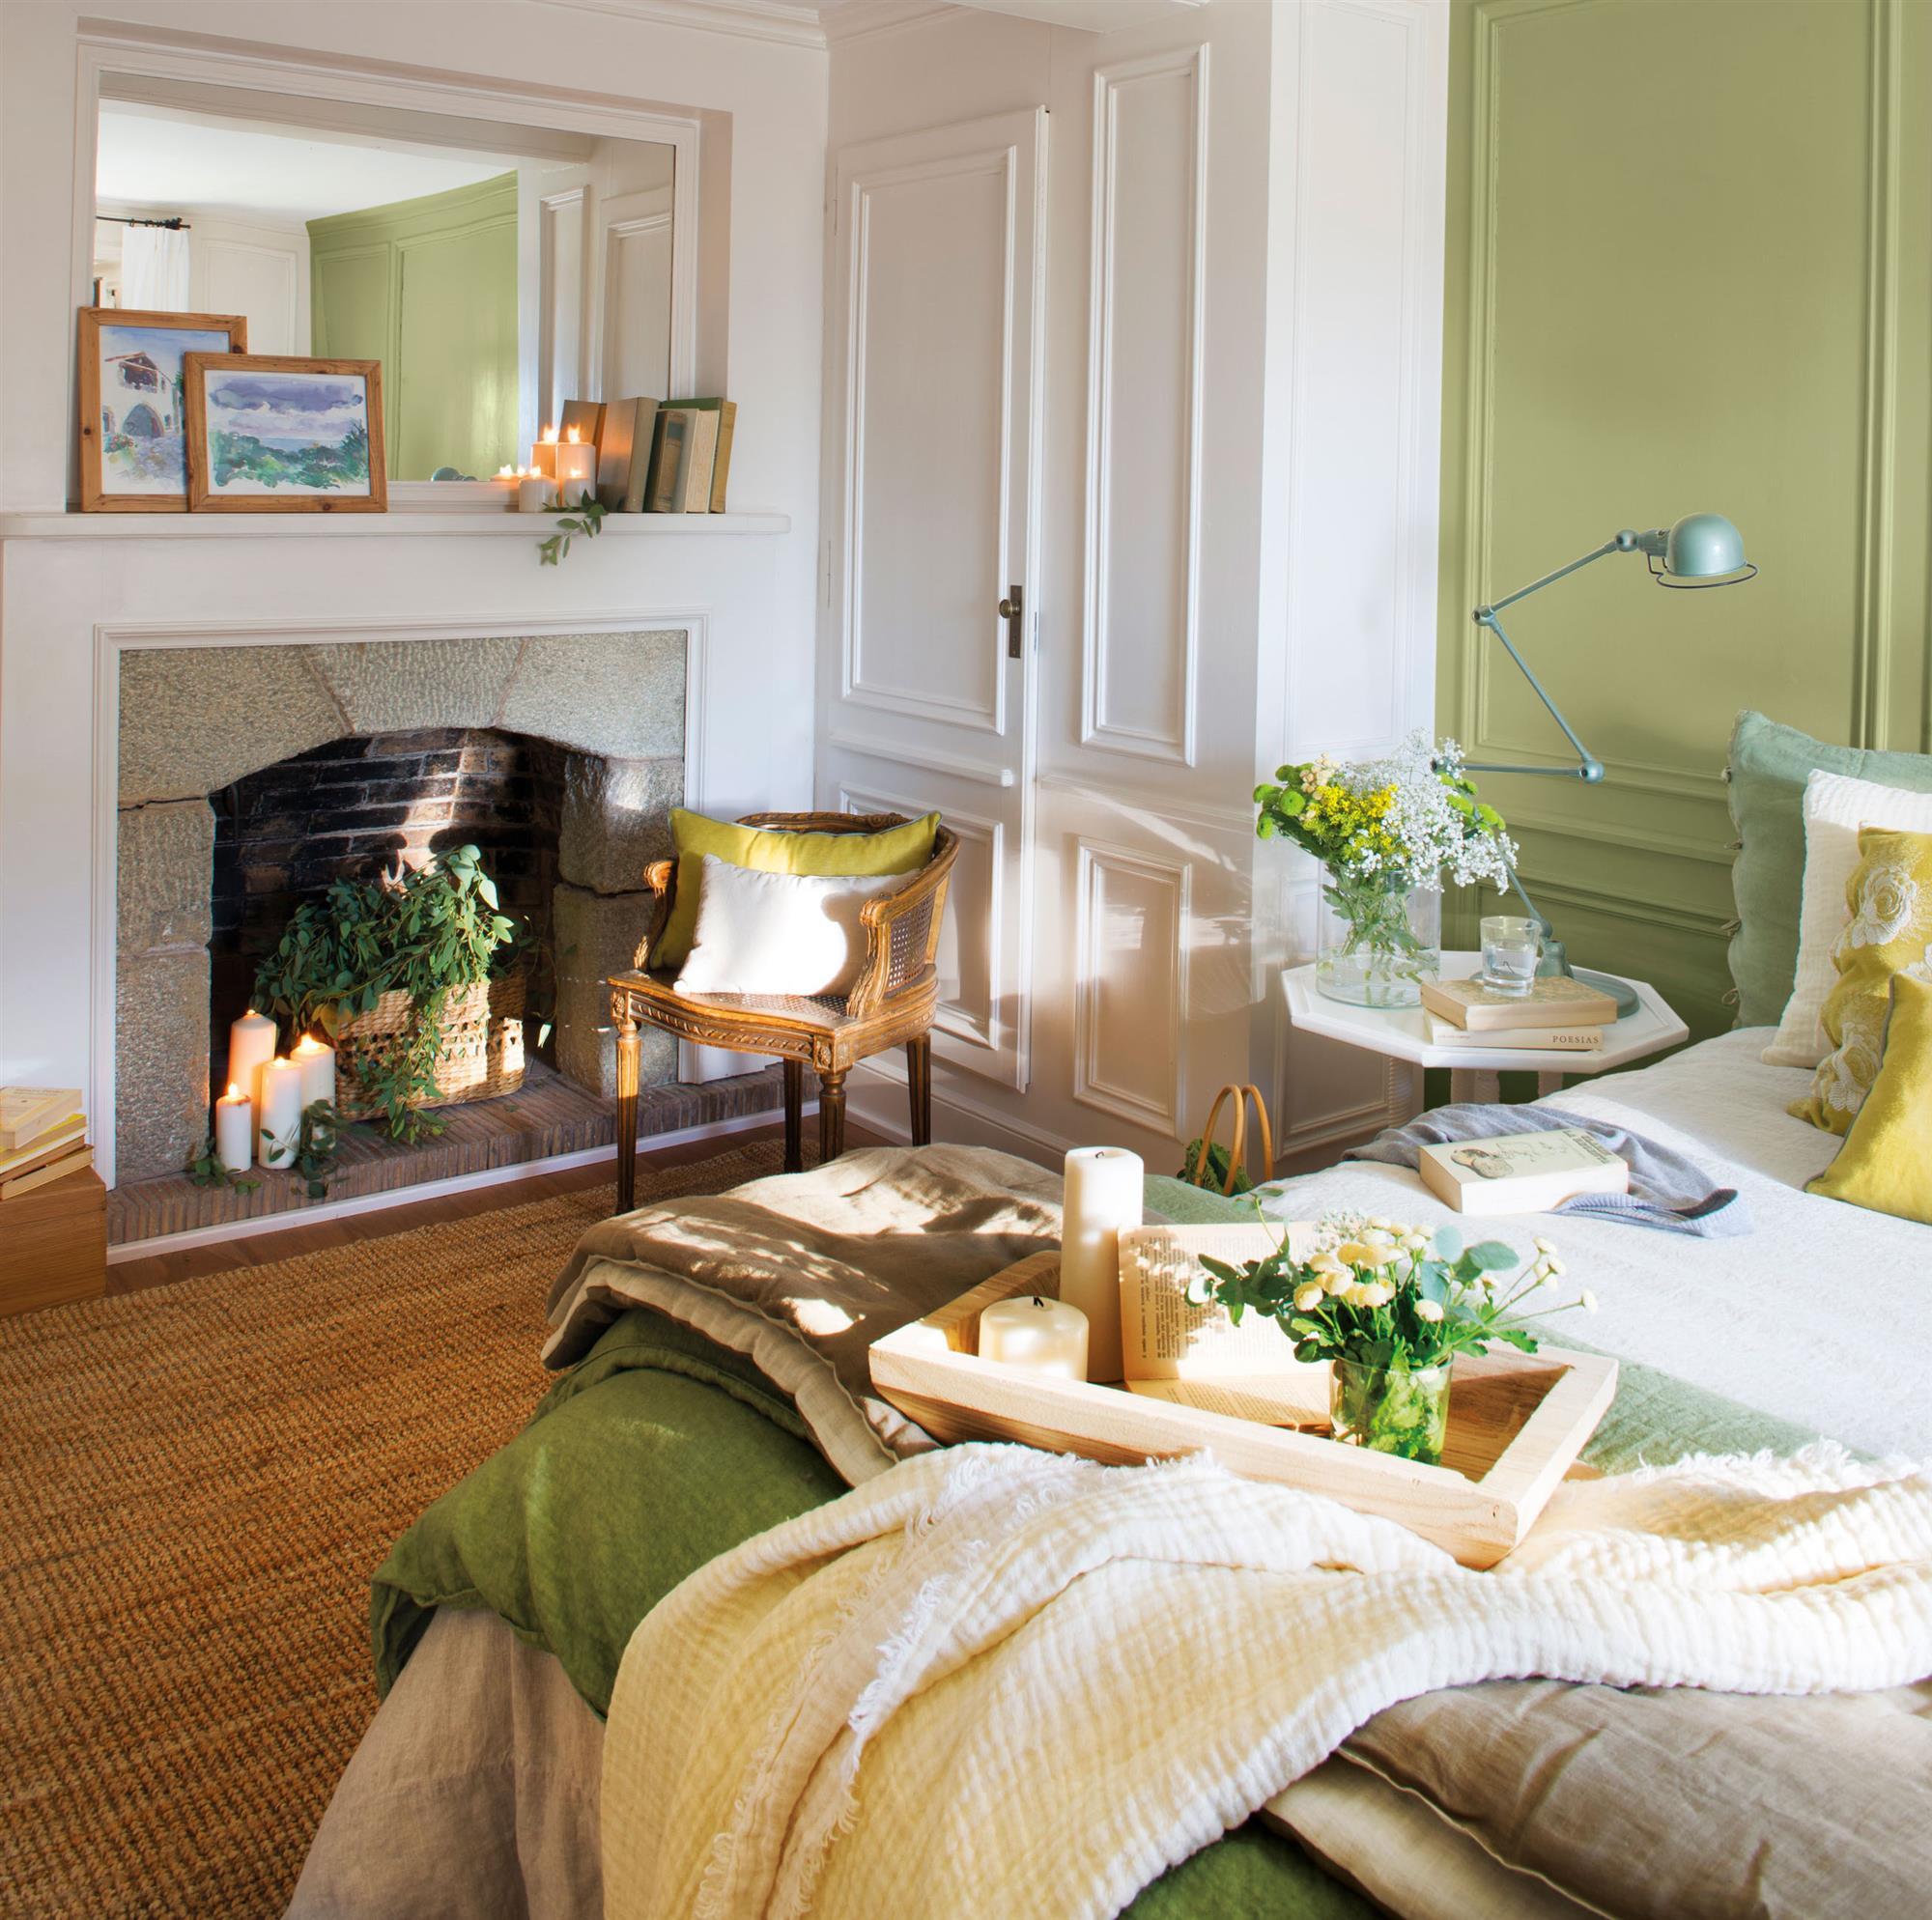 Calentar casa con chimenea stunning esta chimenea solar - Calentar la casa ...